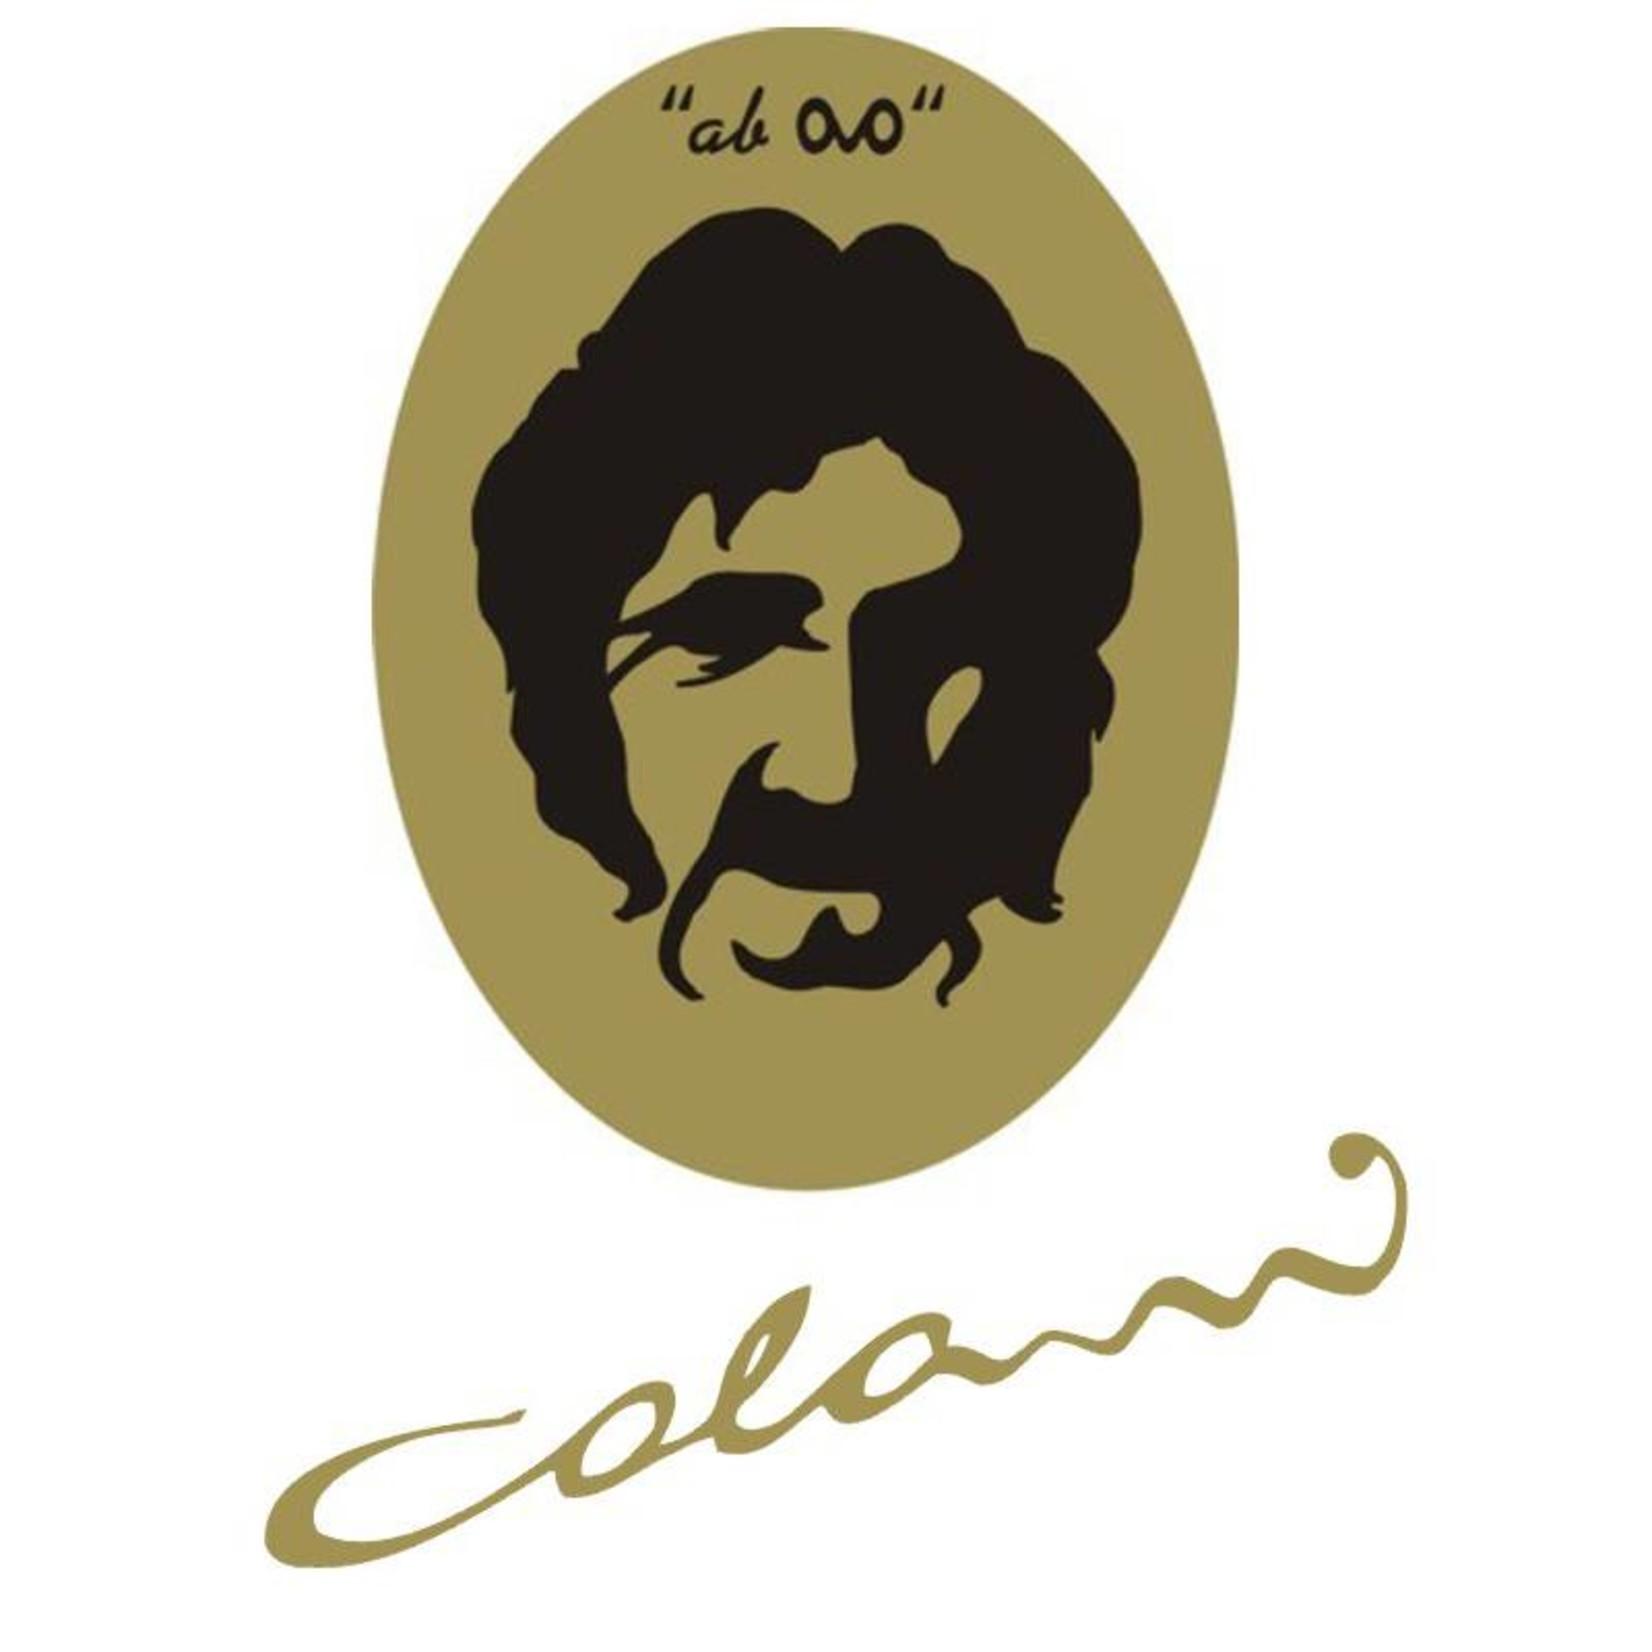 Colani Porzellanserie Colani Espressotasse, groß | Tasse inkl. Unterteller | sand